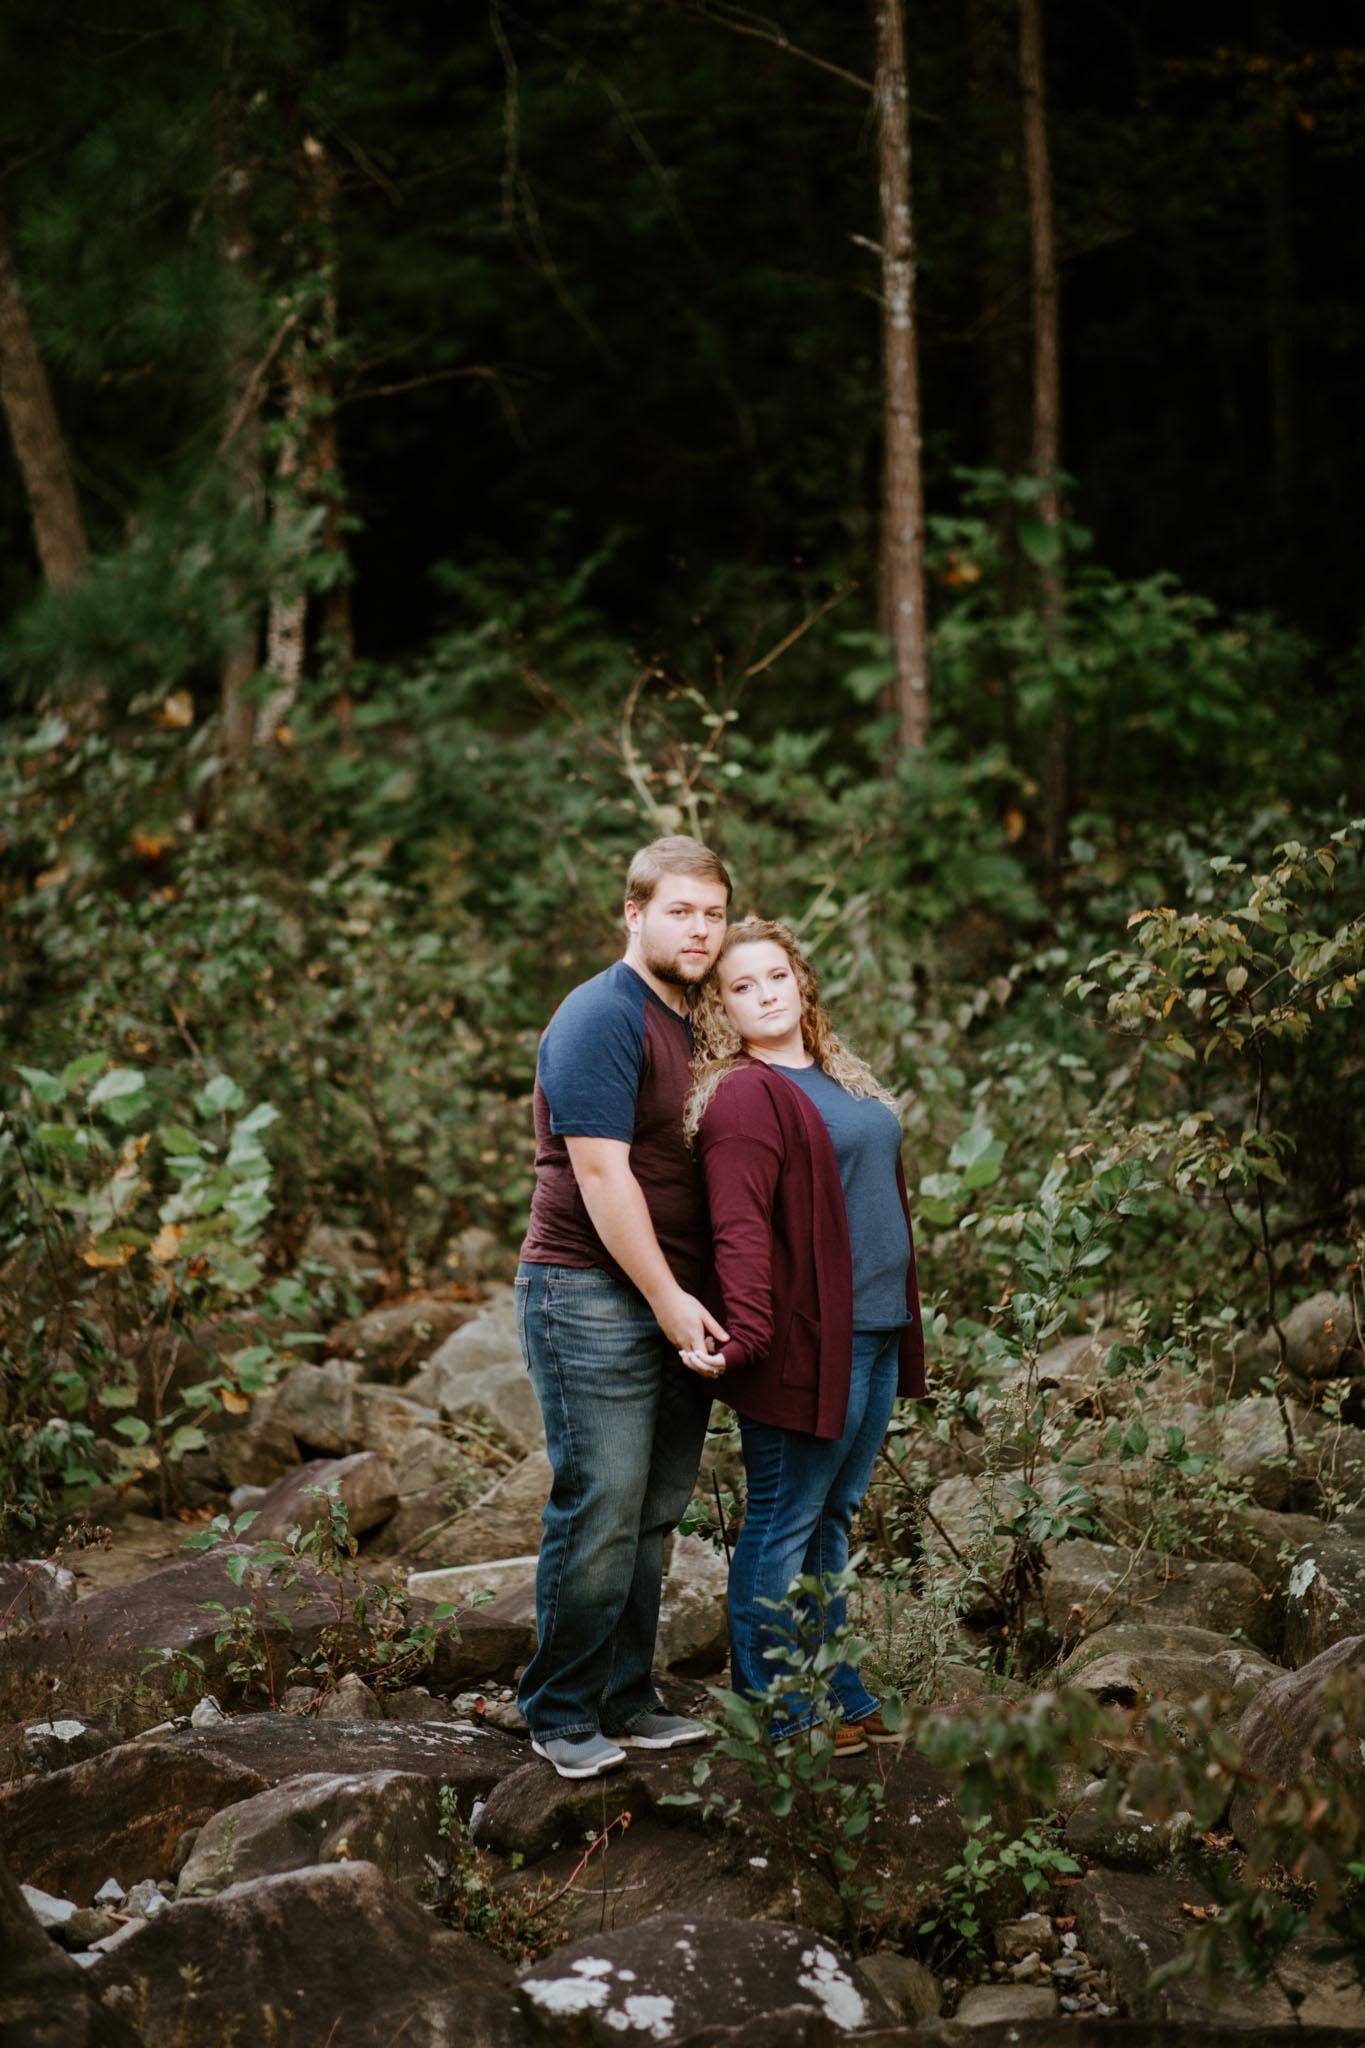 Kaitlin + Blake + Chattanooga + Tennessee + Engagement + Ocoee River + Wedding + Photographer-54.jpg